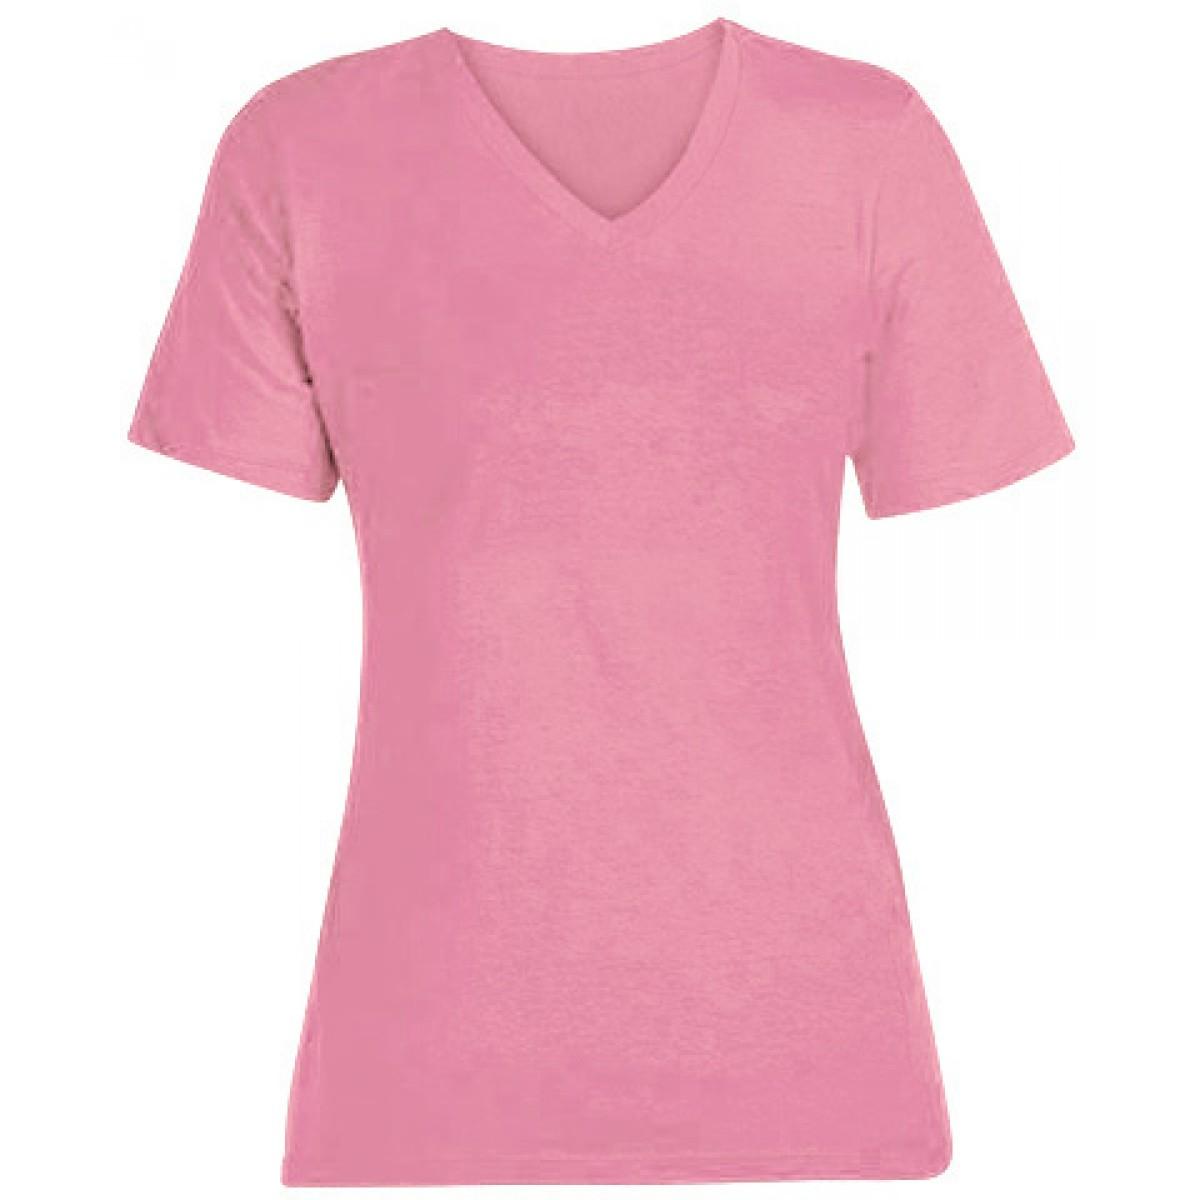 Econscious Ladies Short-Sleeve V-Neck-Pink-XL